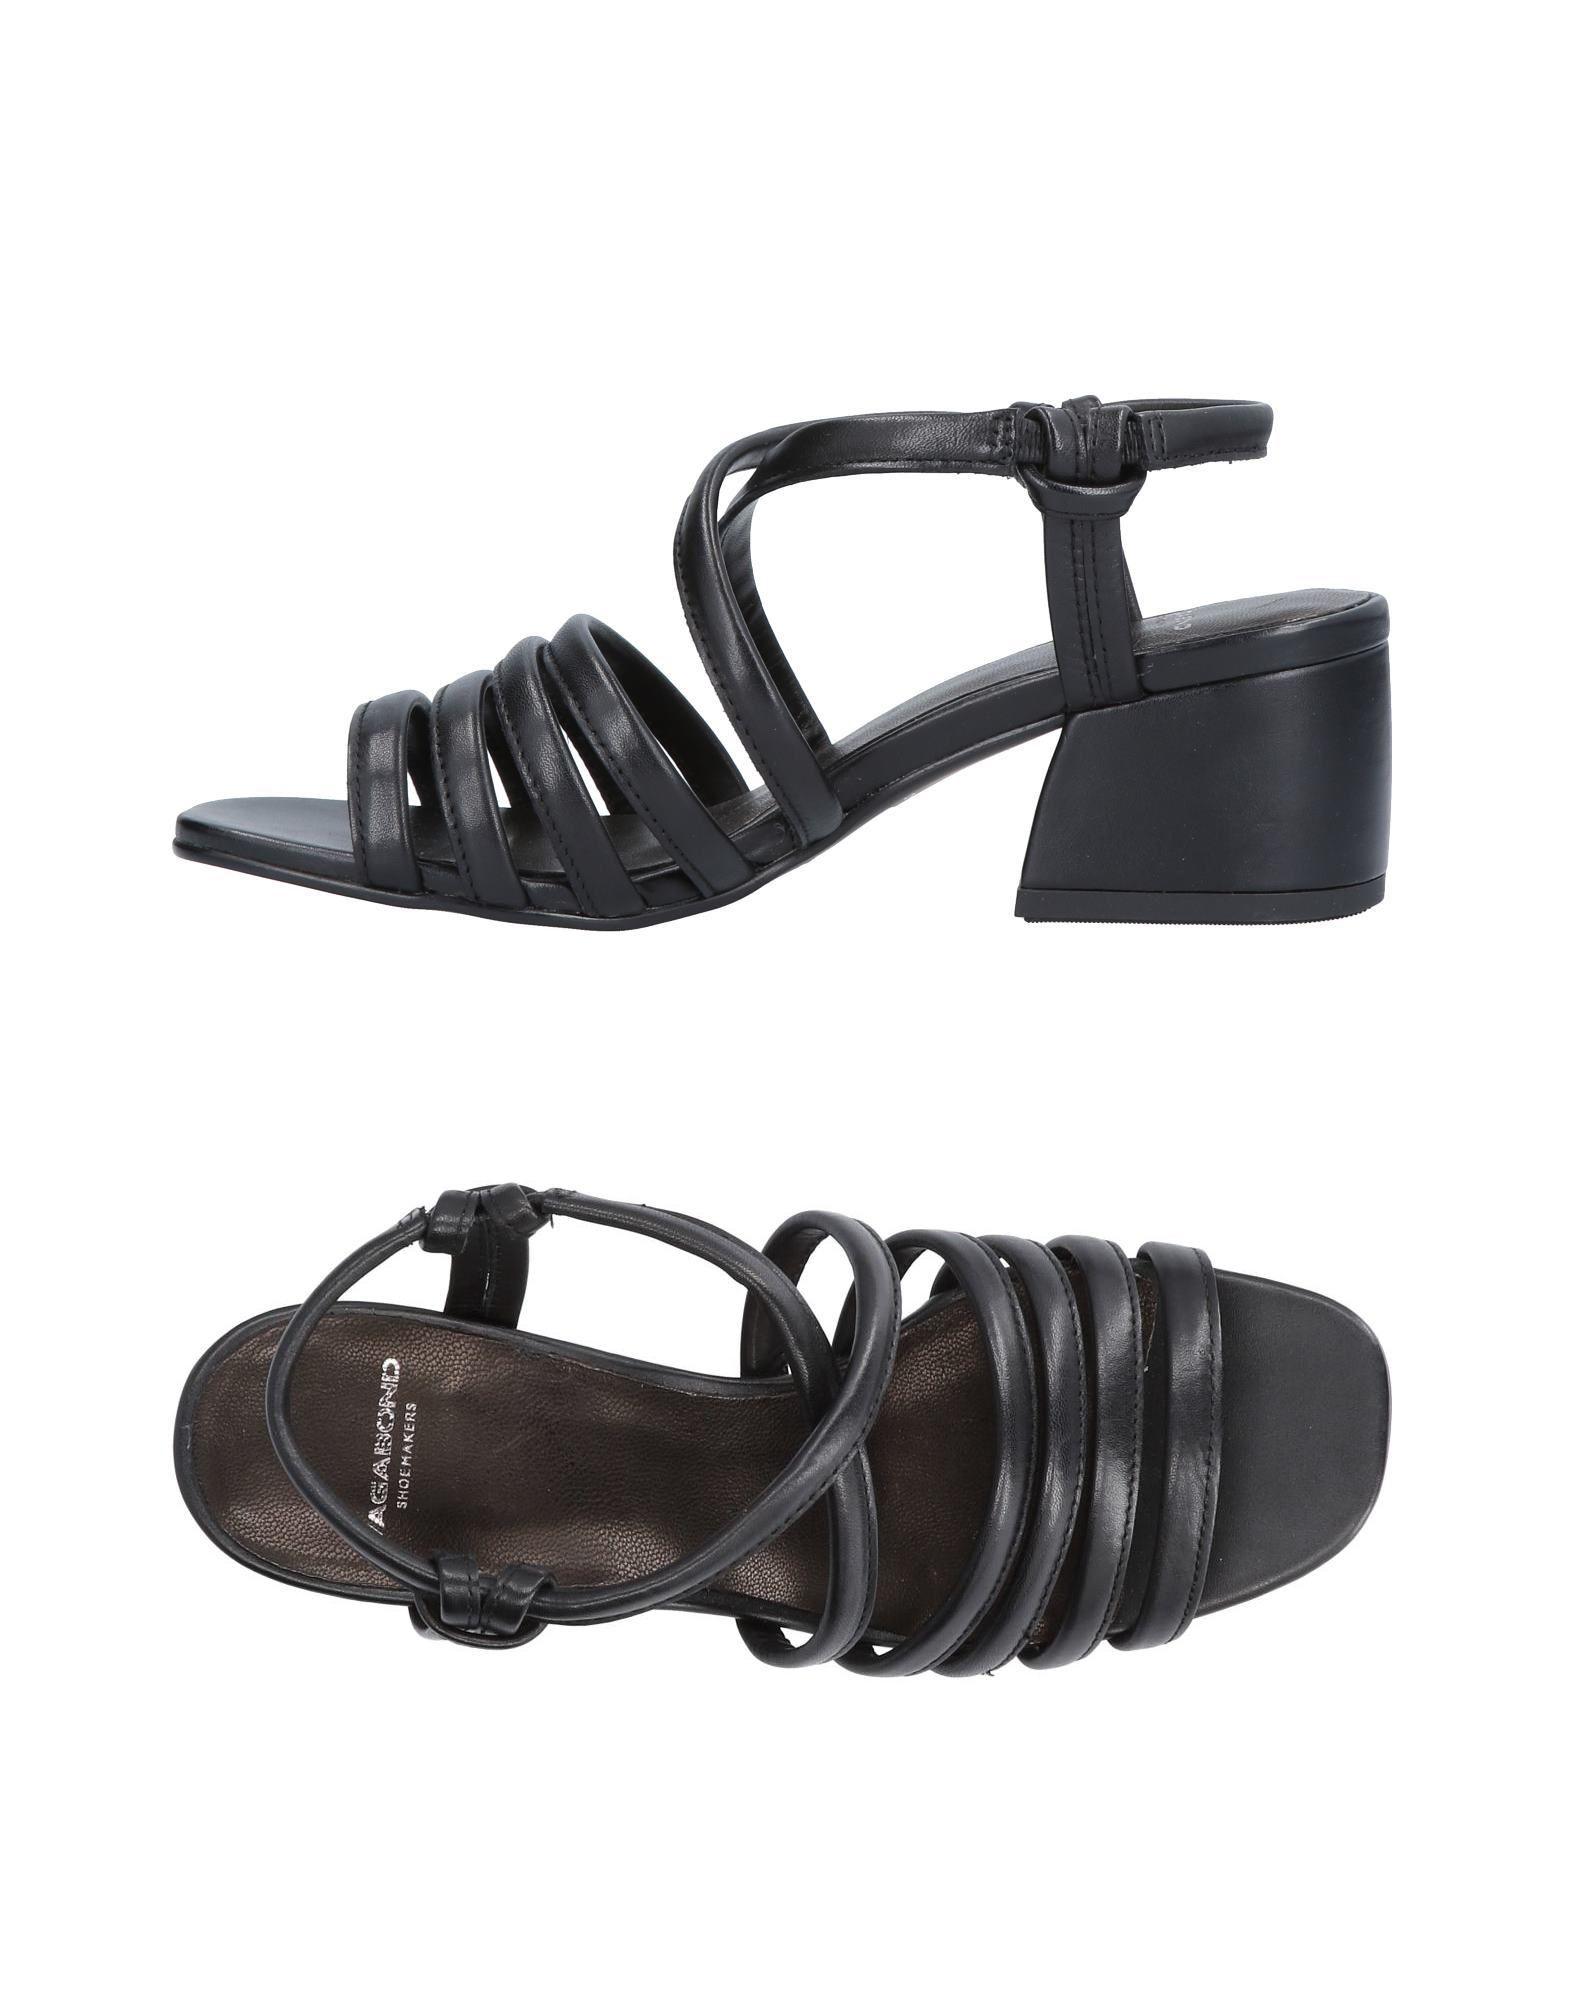 Sandali 11479433GL Vagabond Shoemakers Donna - 11479433GL Sandali 3a8f77